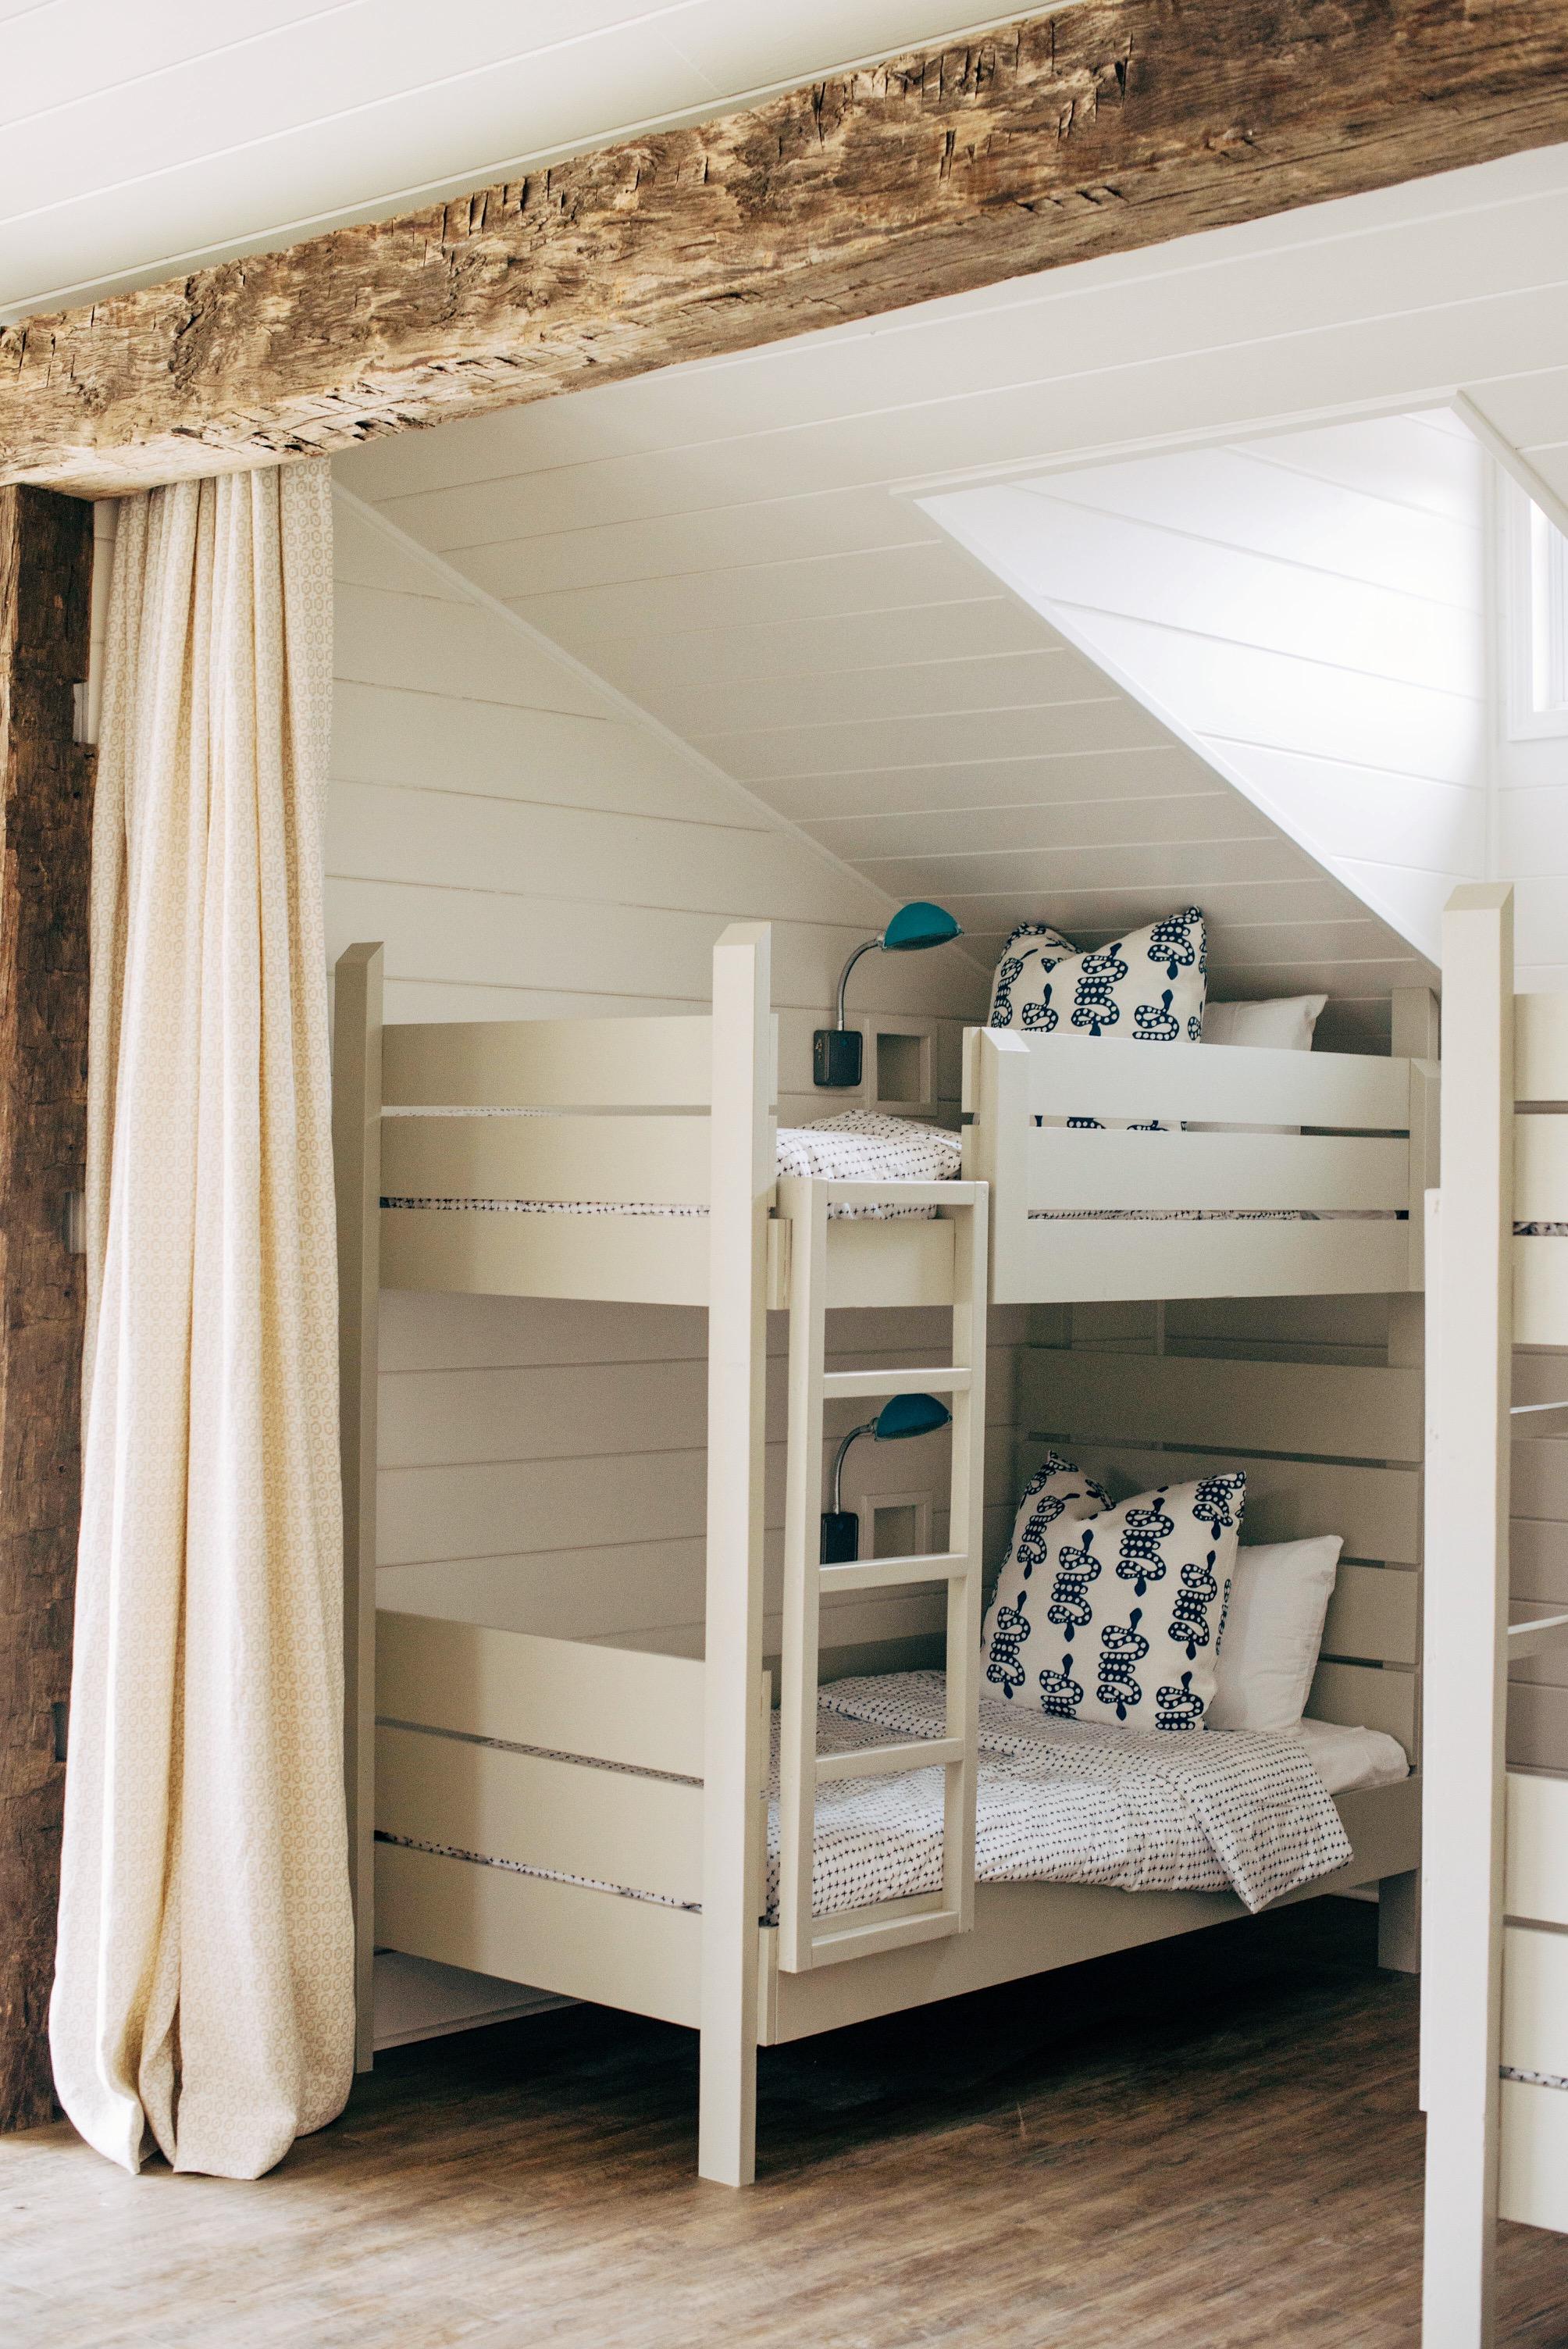 Bunks: BM Winterwood   Walls: BM Simply White   Sarah Catherine Design